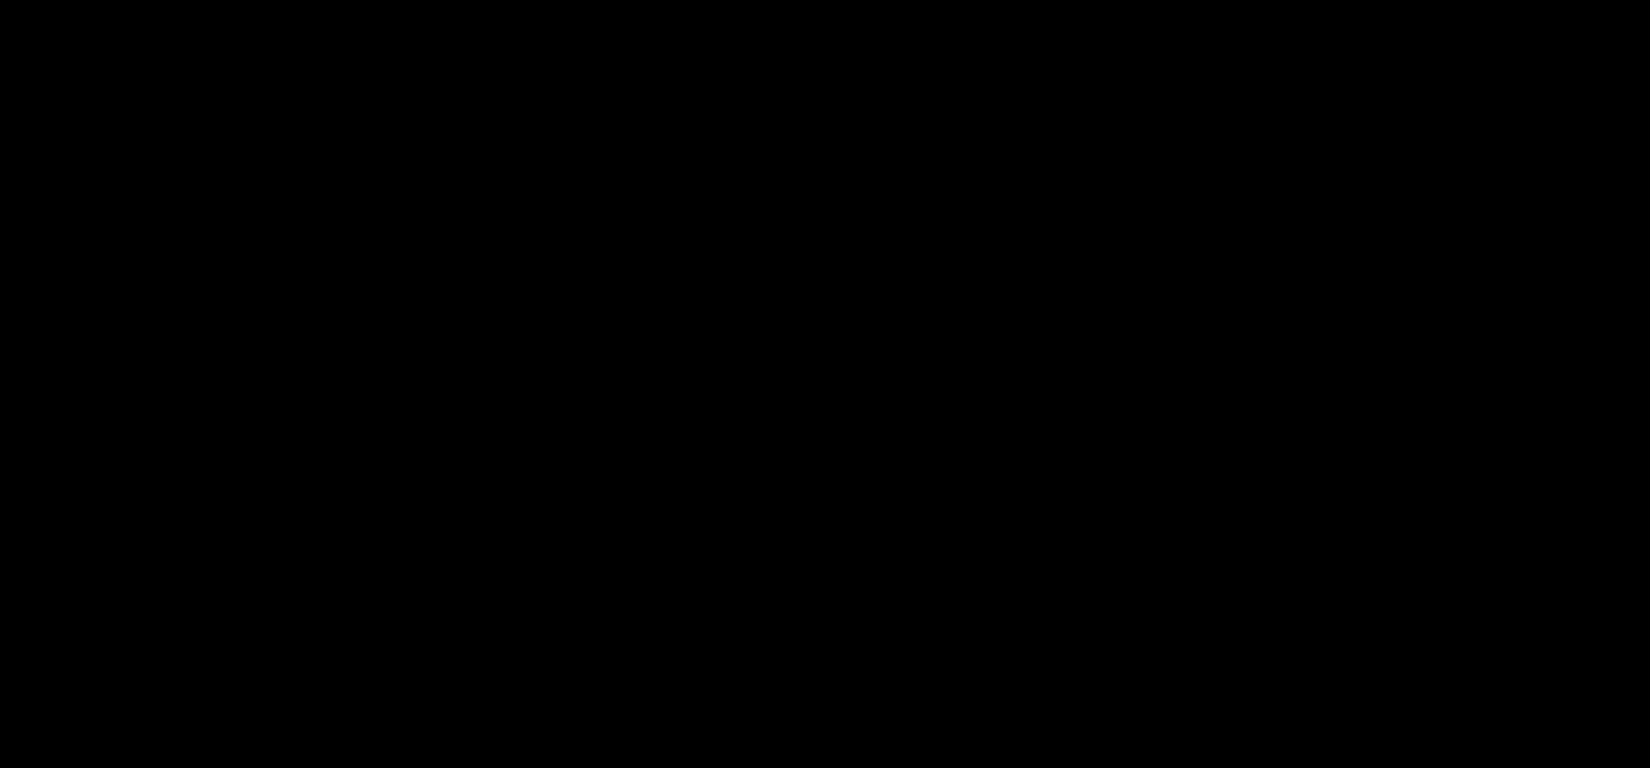 2-O-(p-Nitrophenyl)-α-D-N-acetylneuraminic acid